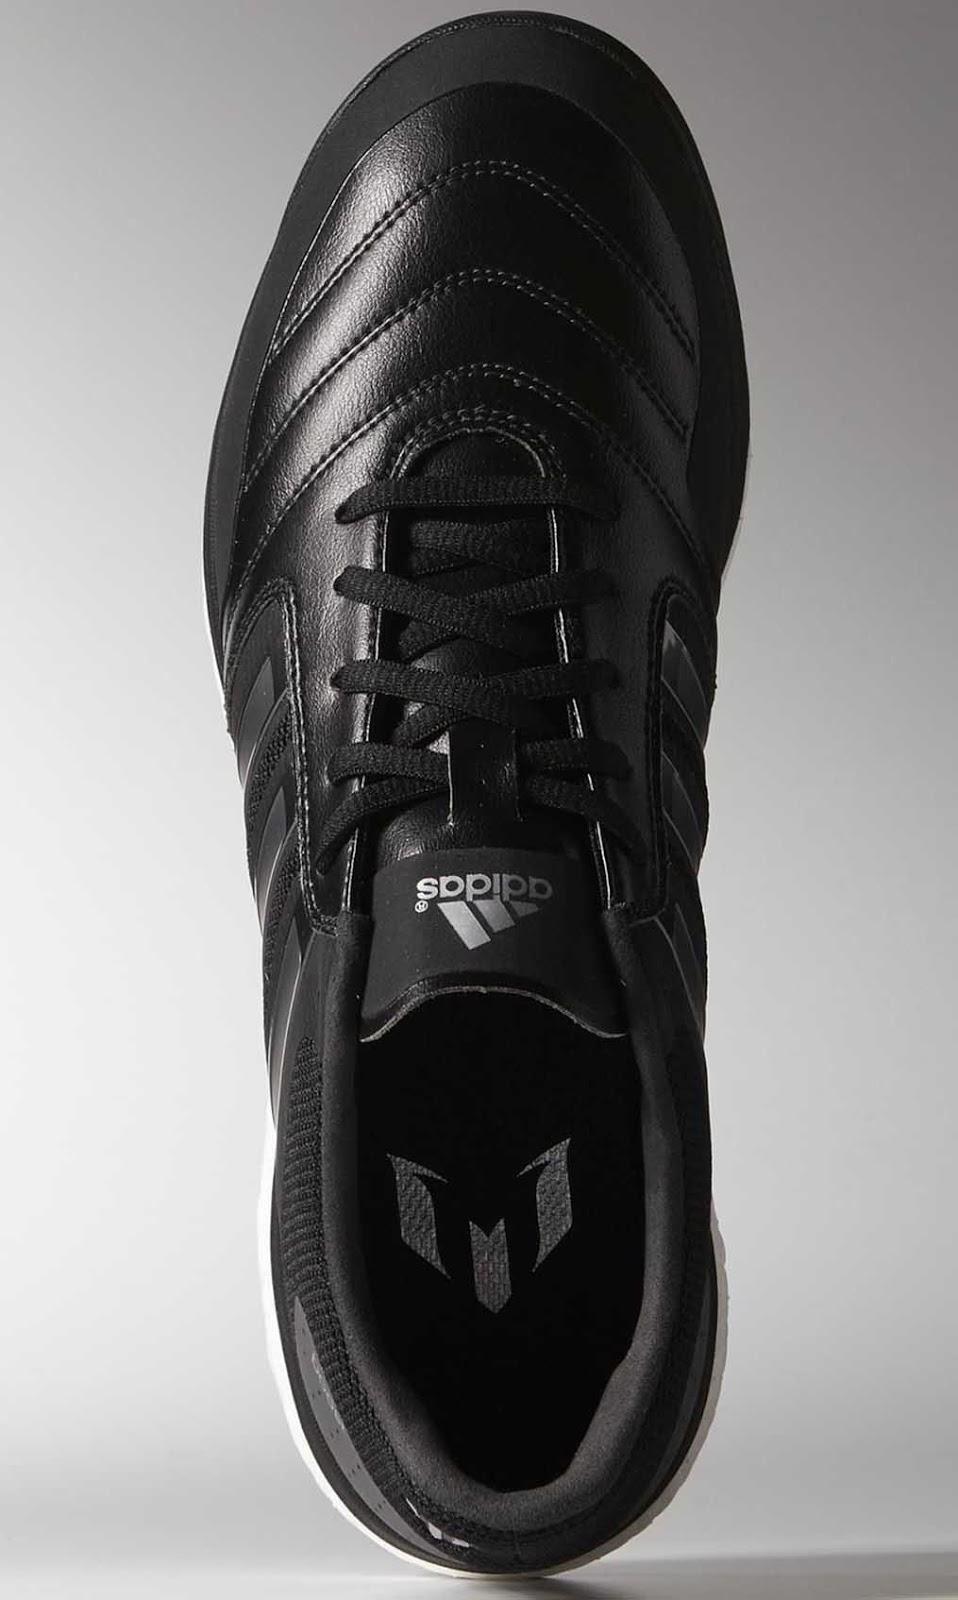 Adidas Freefootball Boost Shoes